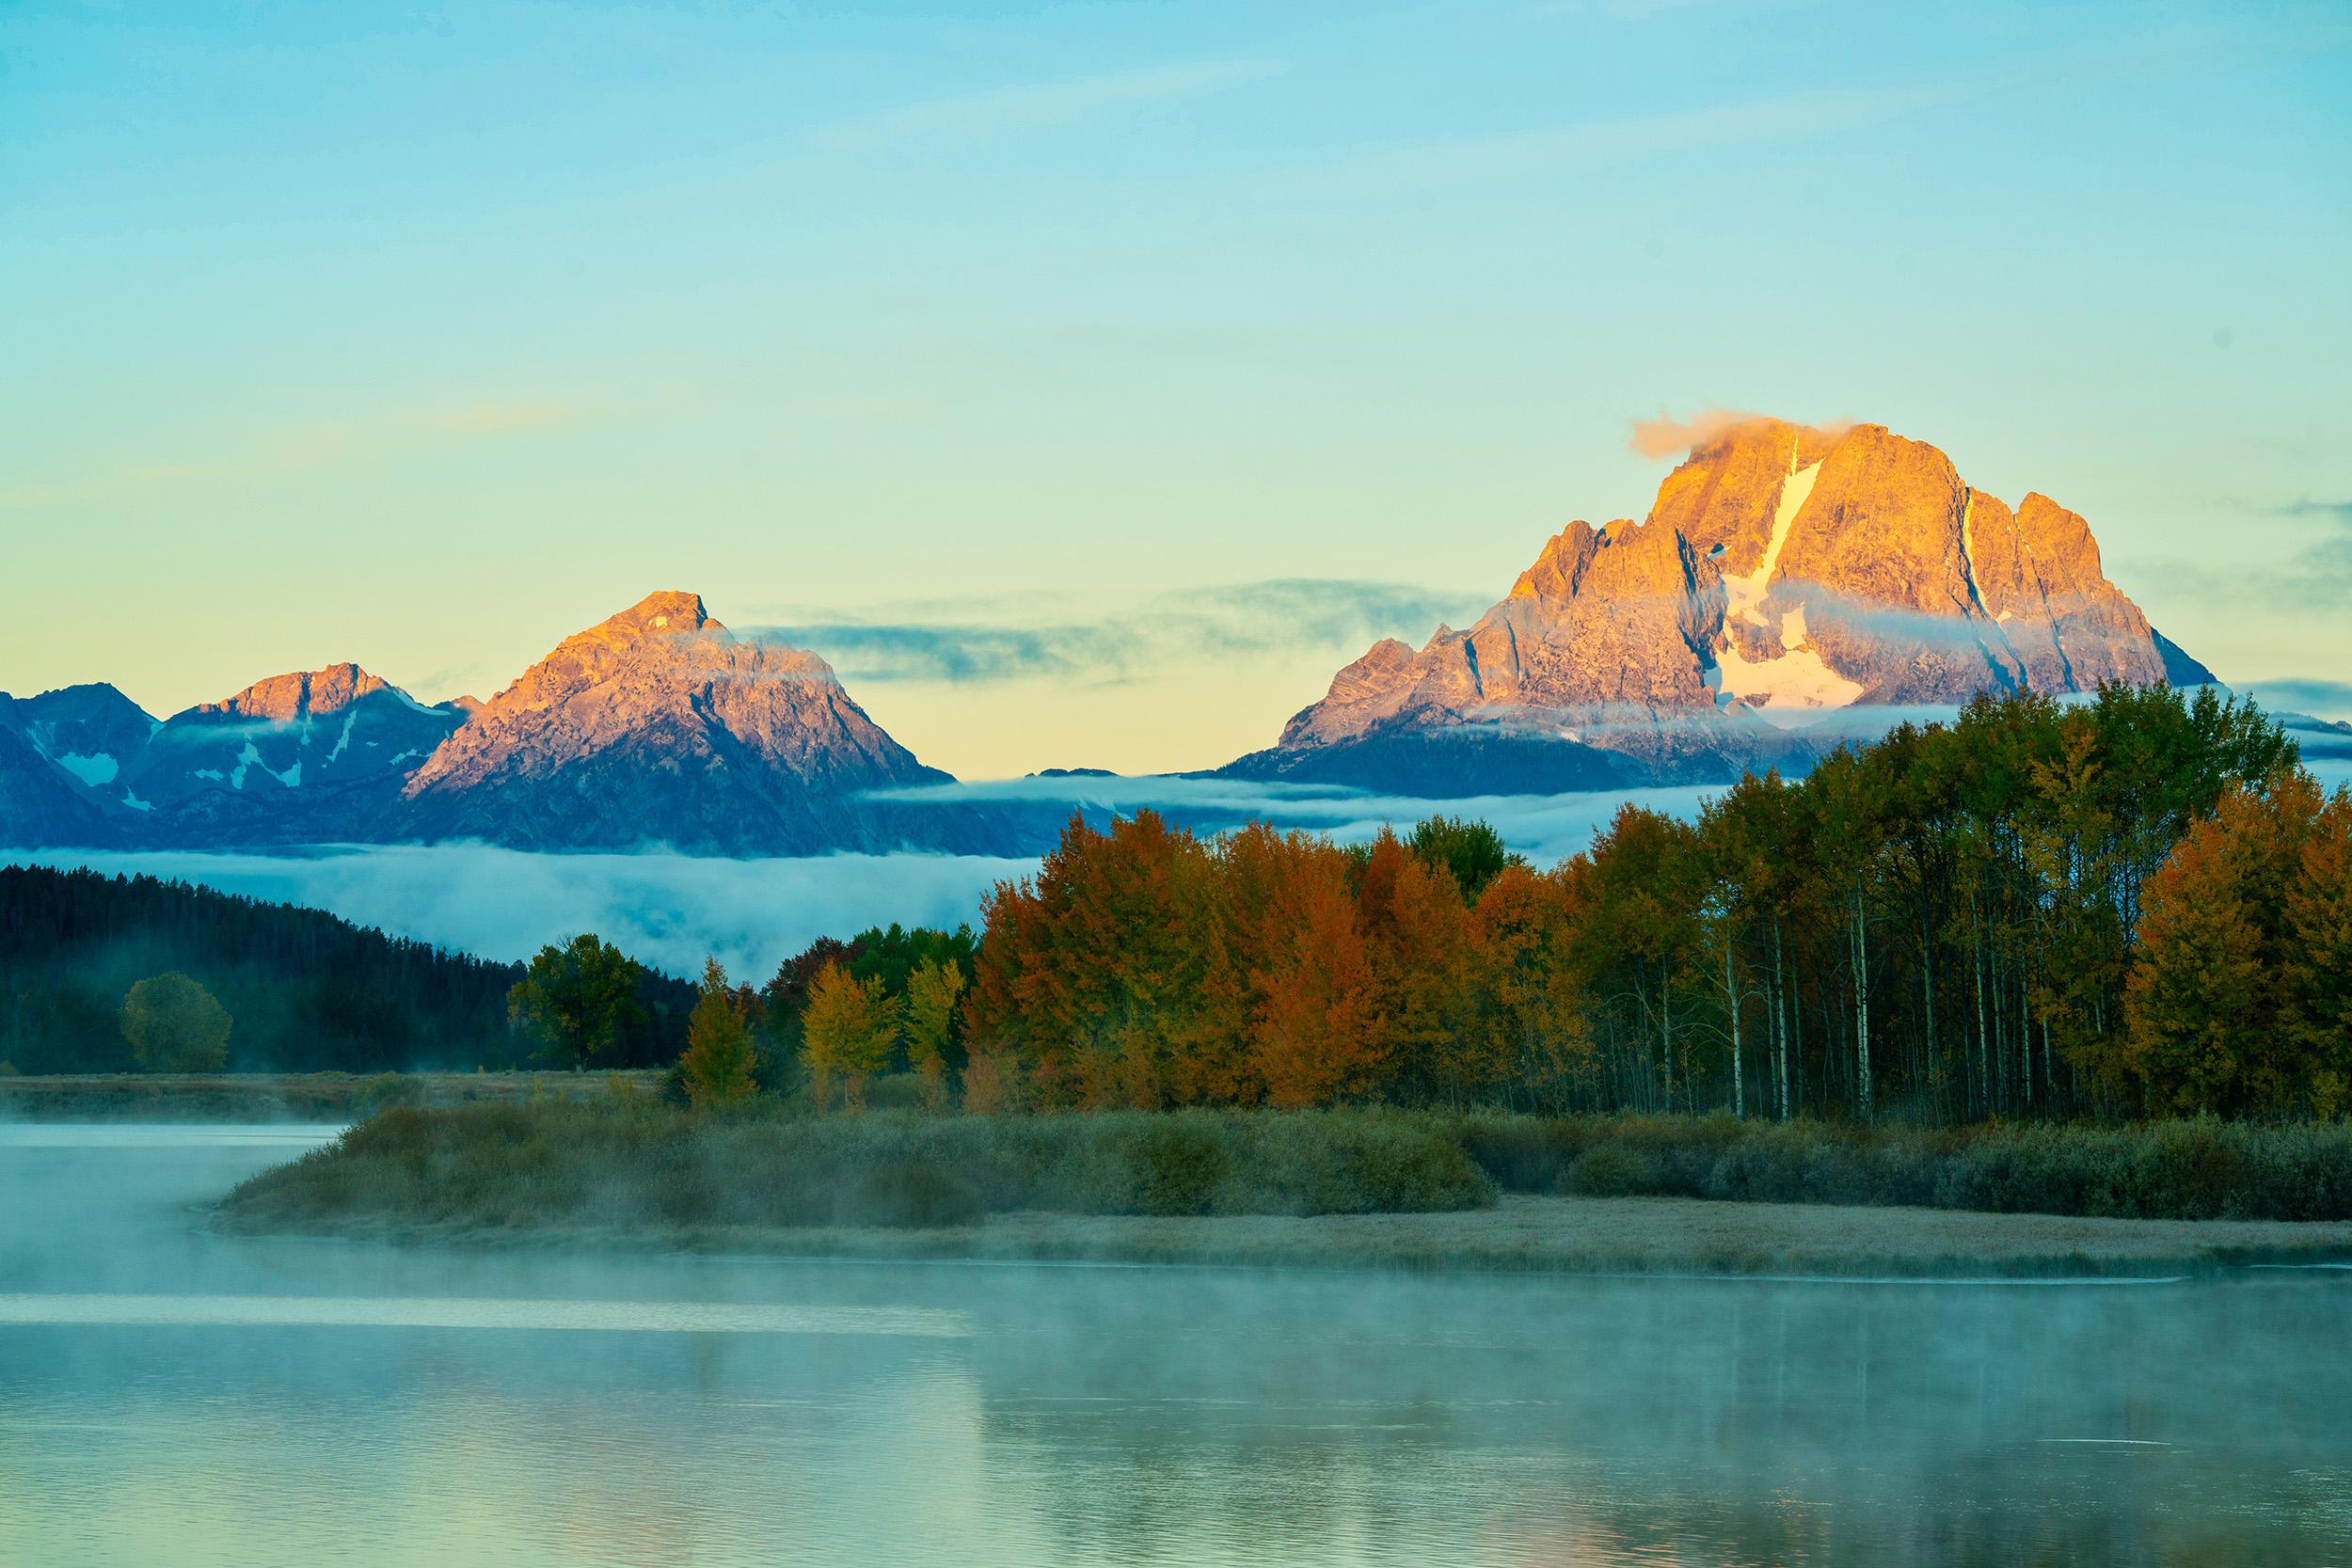 #fog, #fallcolor, #mountmoran, #jacksonhole, #grandtetons, #grandtetonnationalpark, #sunrise, #nationalparks, #snakeriver, #fall, #landscape, #wyoming